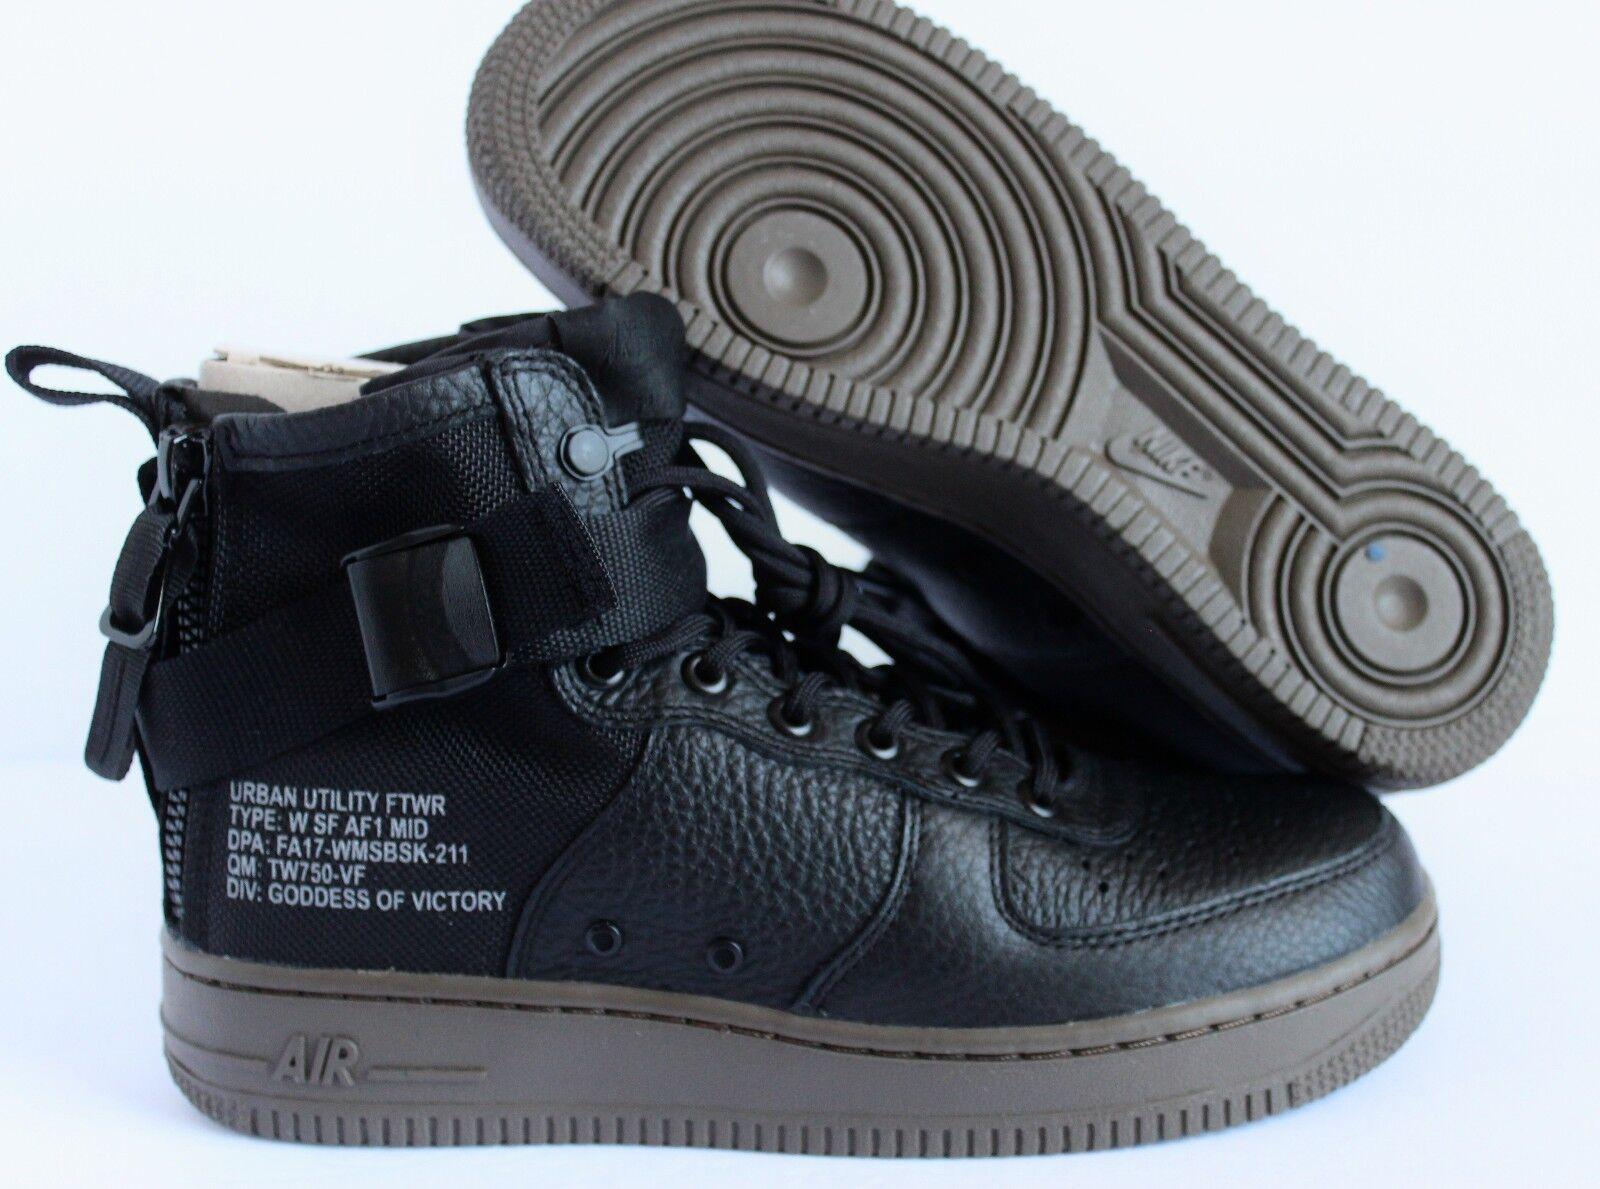 Women's Nike SF Air Force 1 Mid shoes Black Dark Hazel SZ 7.5 [AA3966 003]